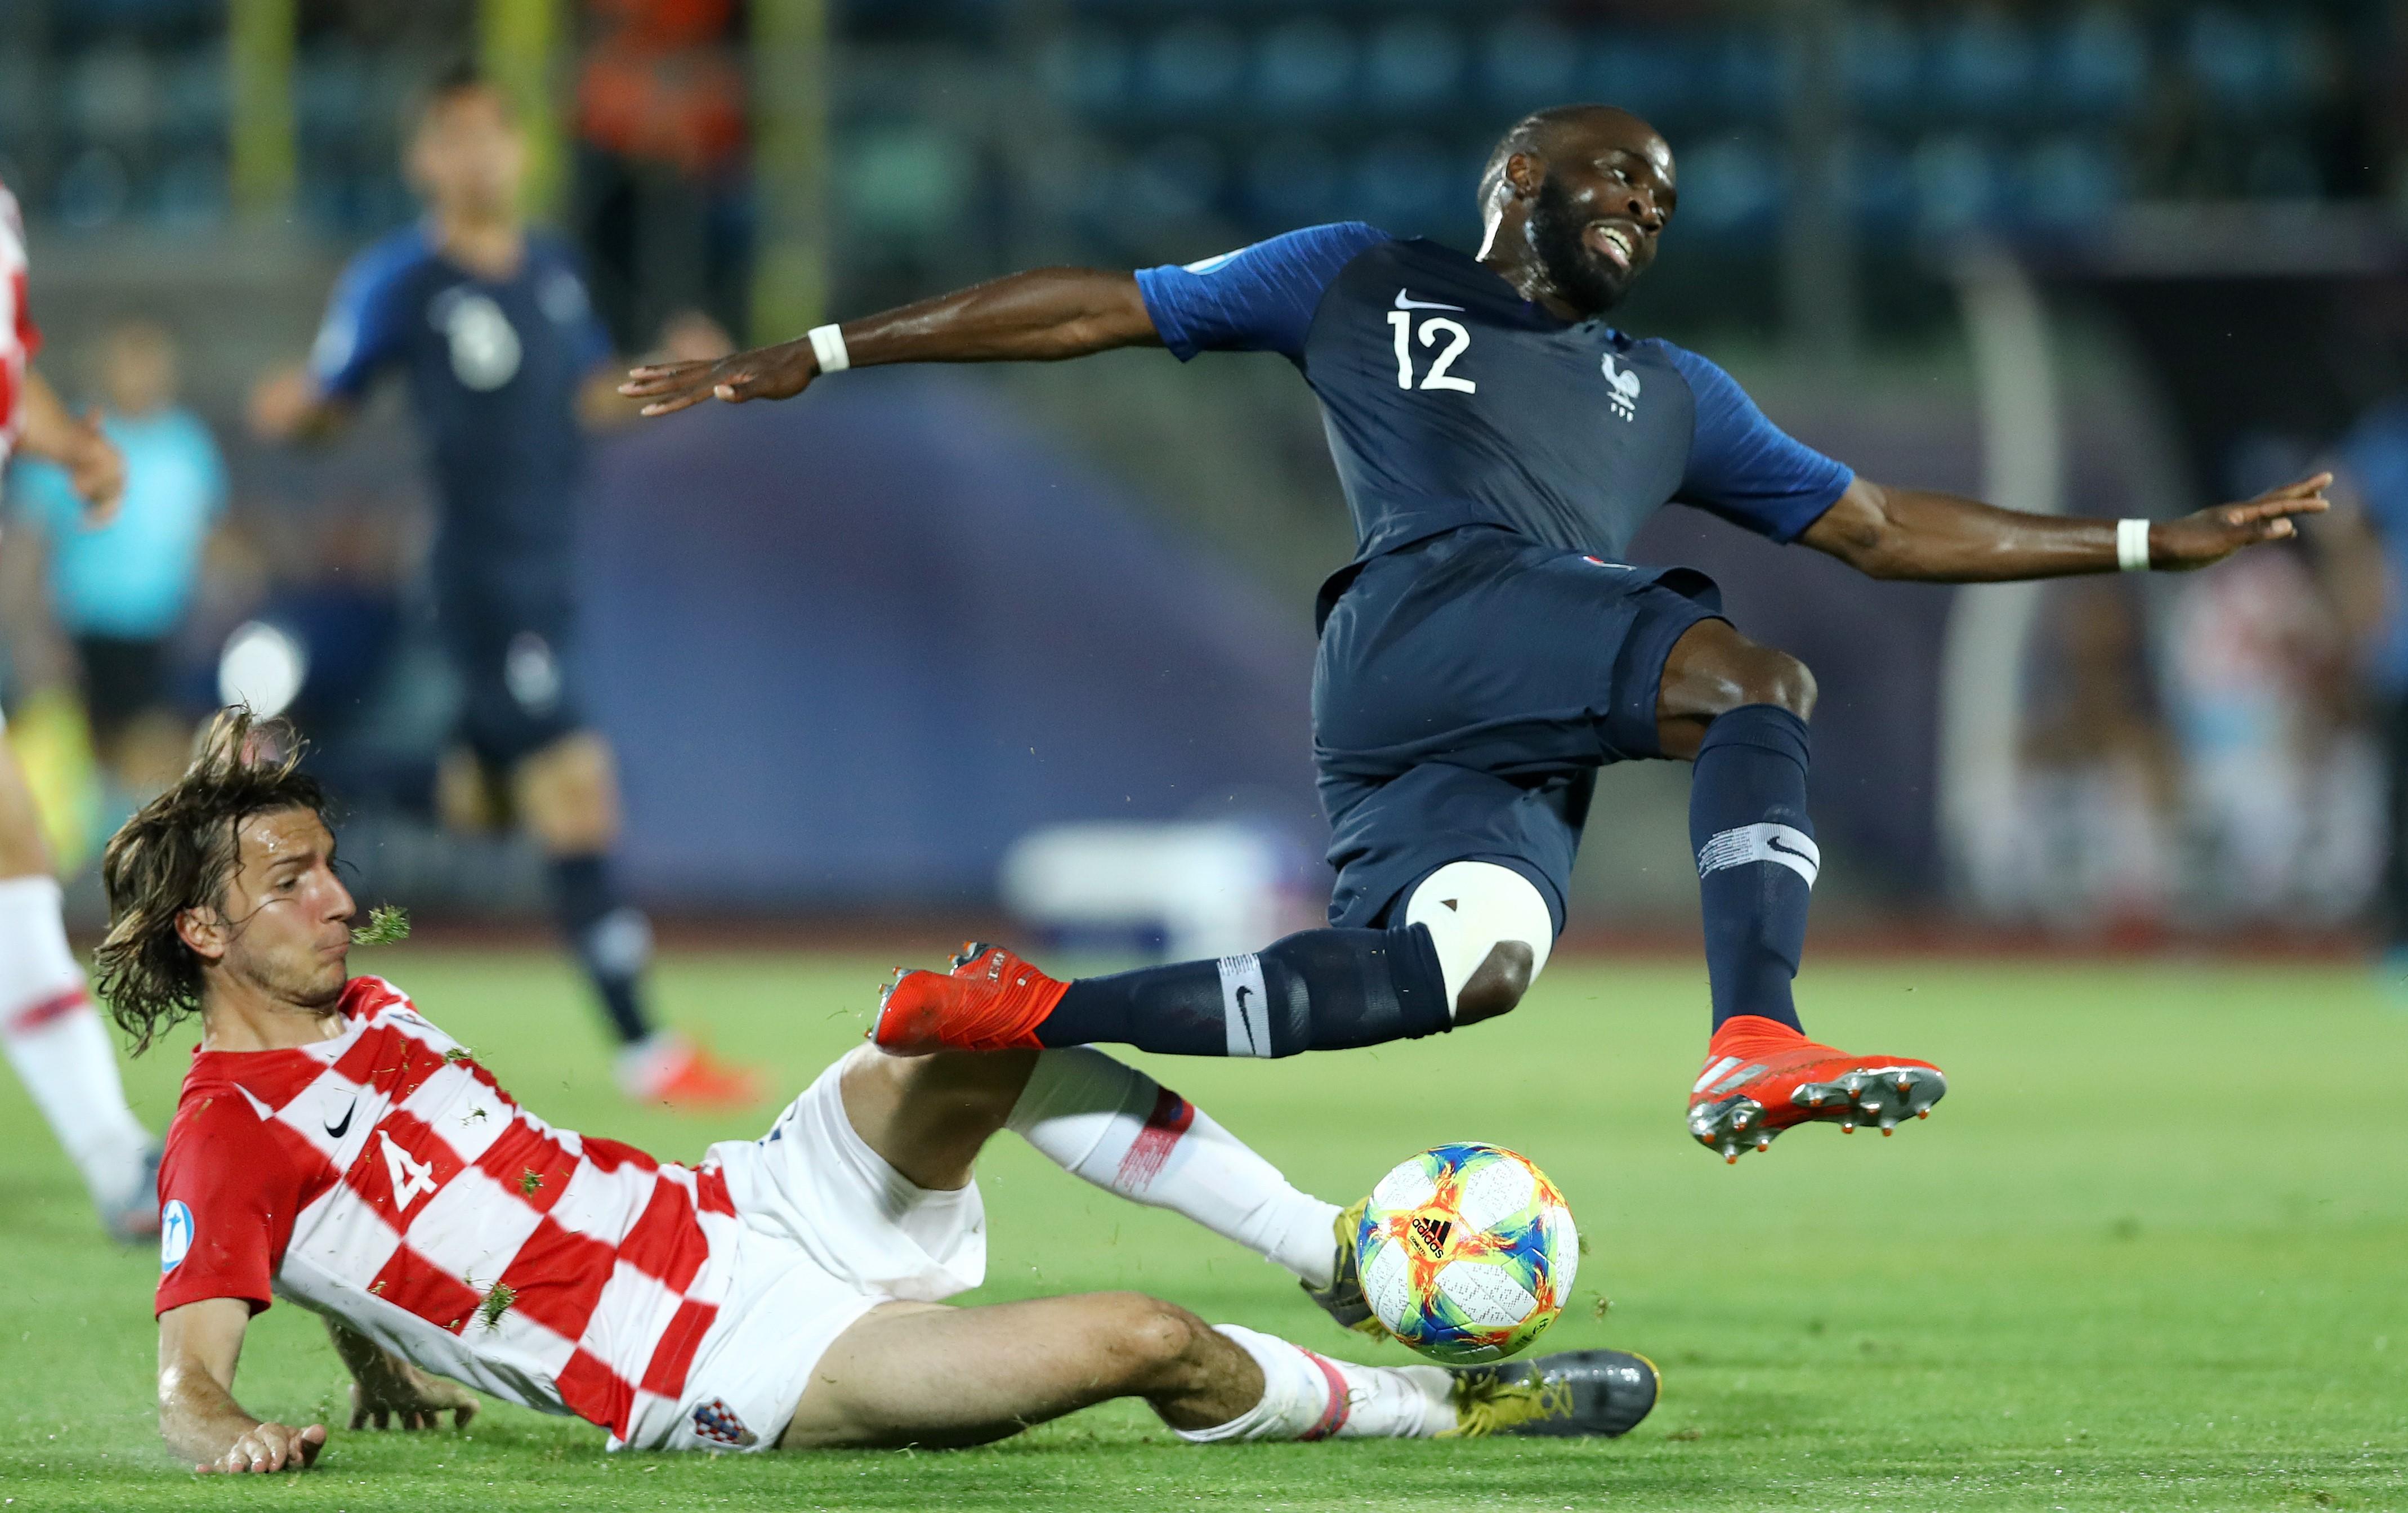 Ivan Sunjic tacle Jonathan Ikoné lors de France-Croatie / Euro espoirs 2019